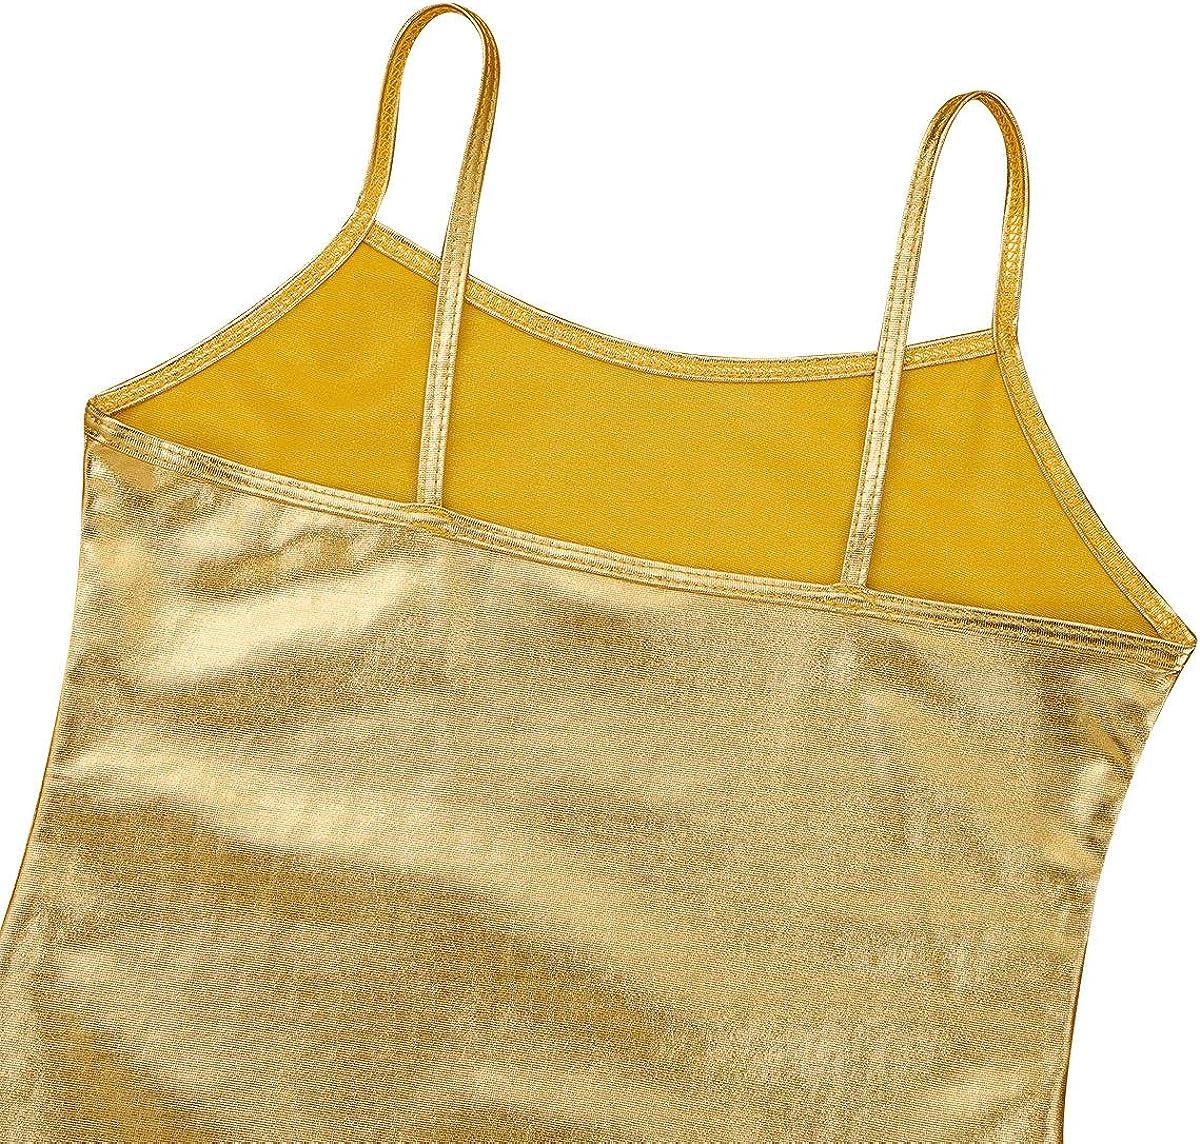 YONGHS Kids Girls Gymnastic Cami Tops Spaghetti Shoulder Straps Active Workout Sports Tank Top Dancewear